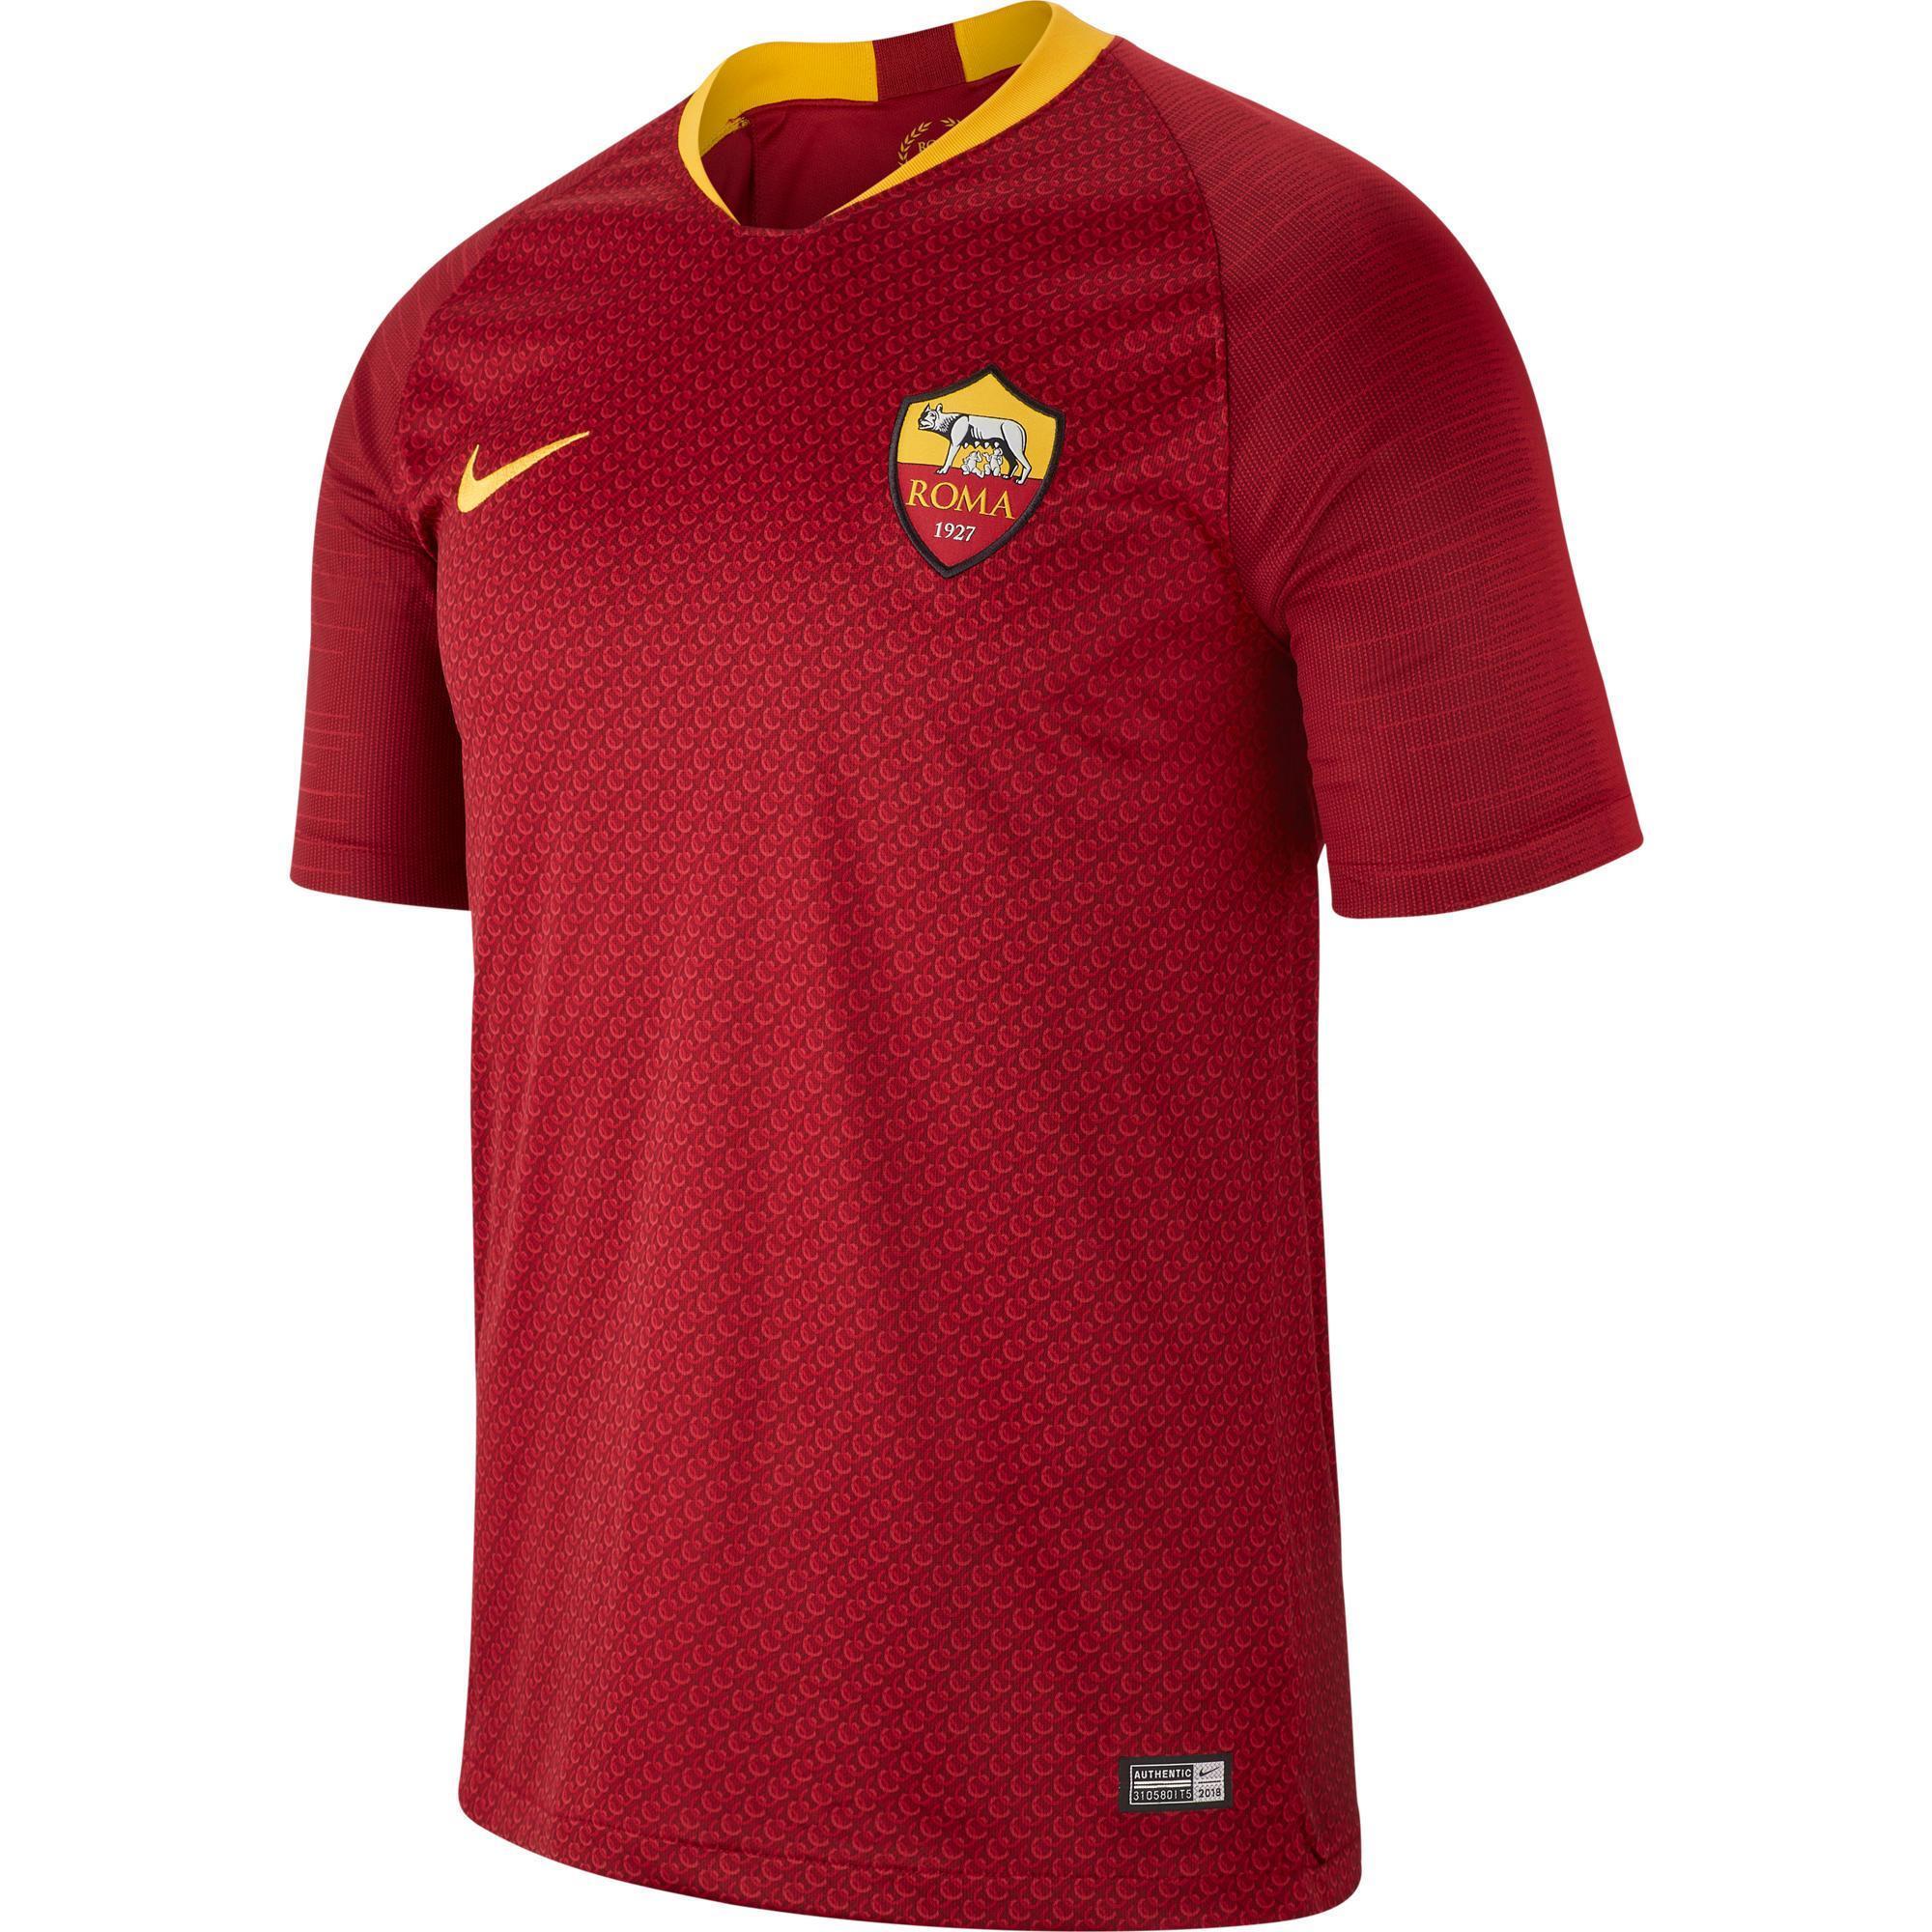 Nike Voetbalshirt AS Roma thuisshirt 18/19 voor volwassenen rood